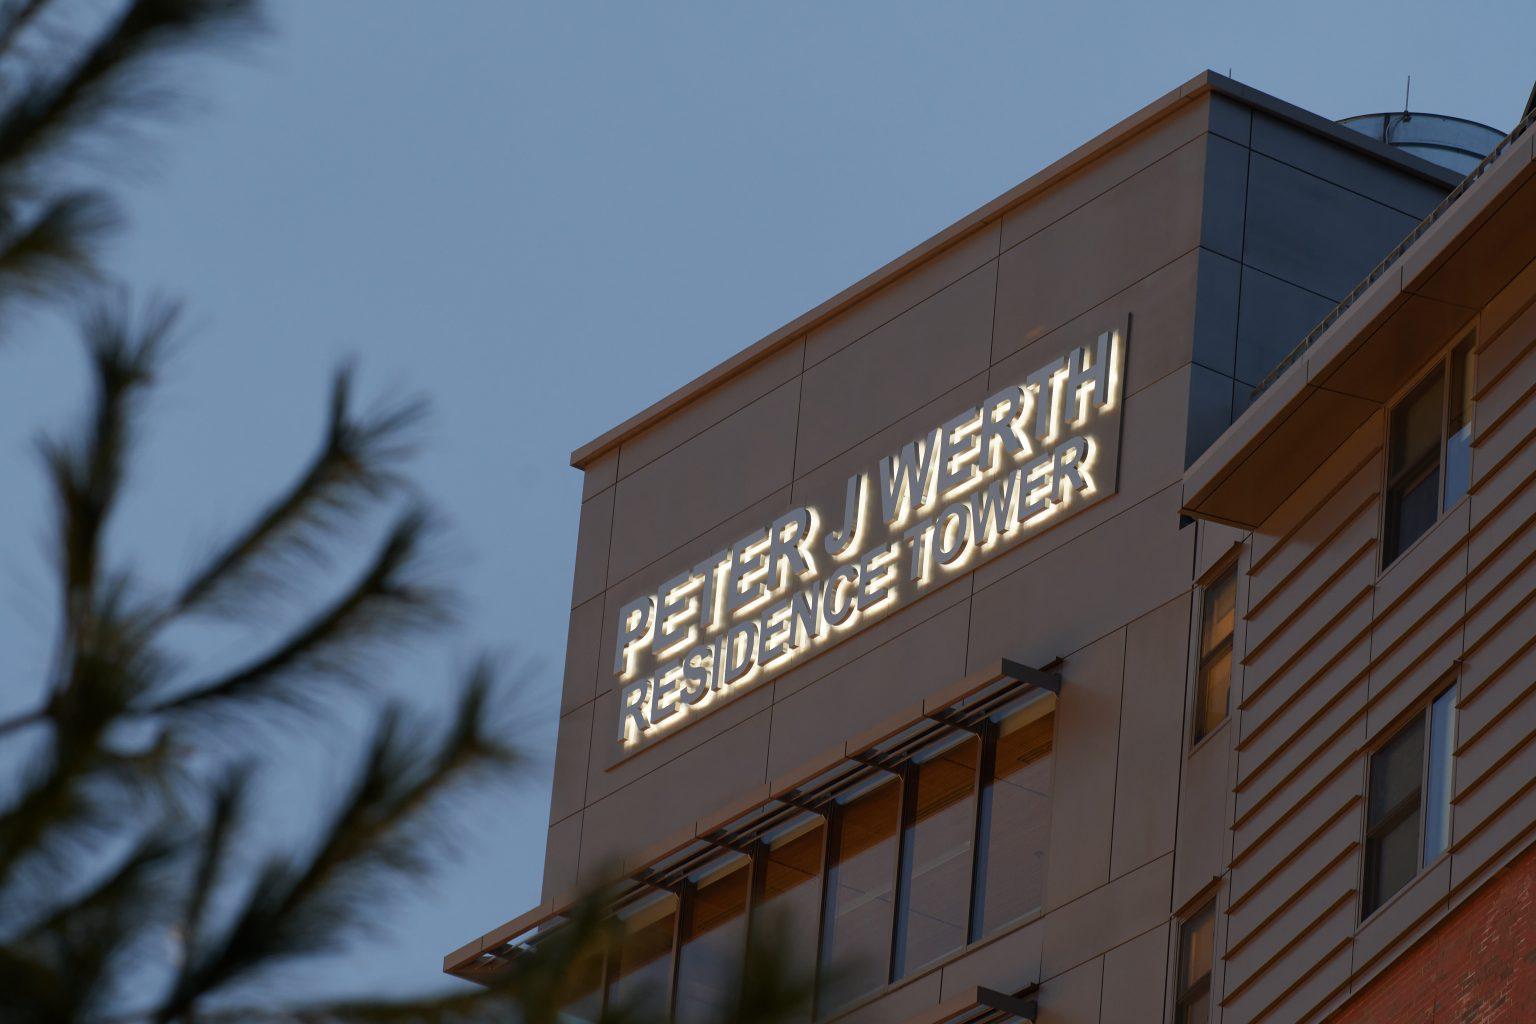 Werth Tower Building